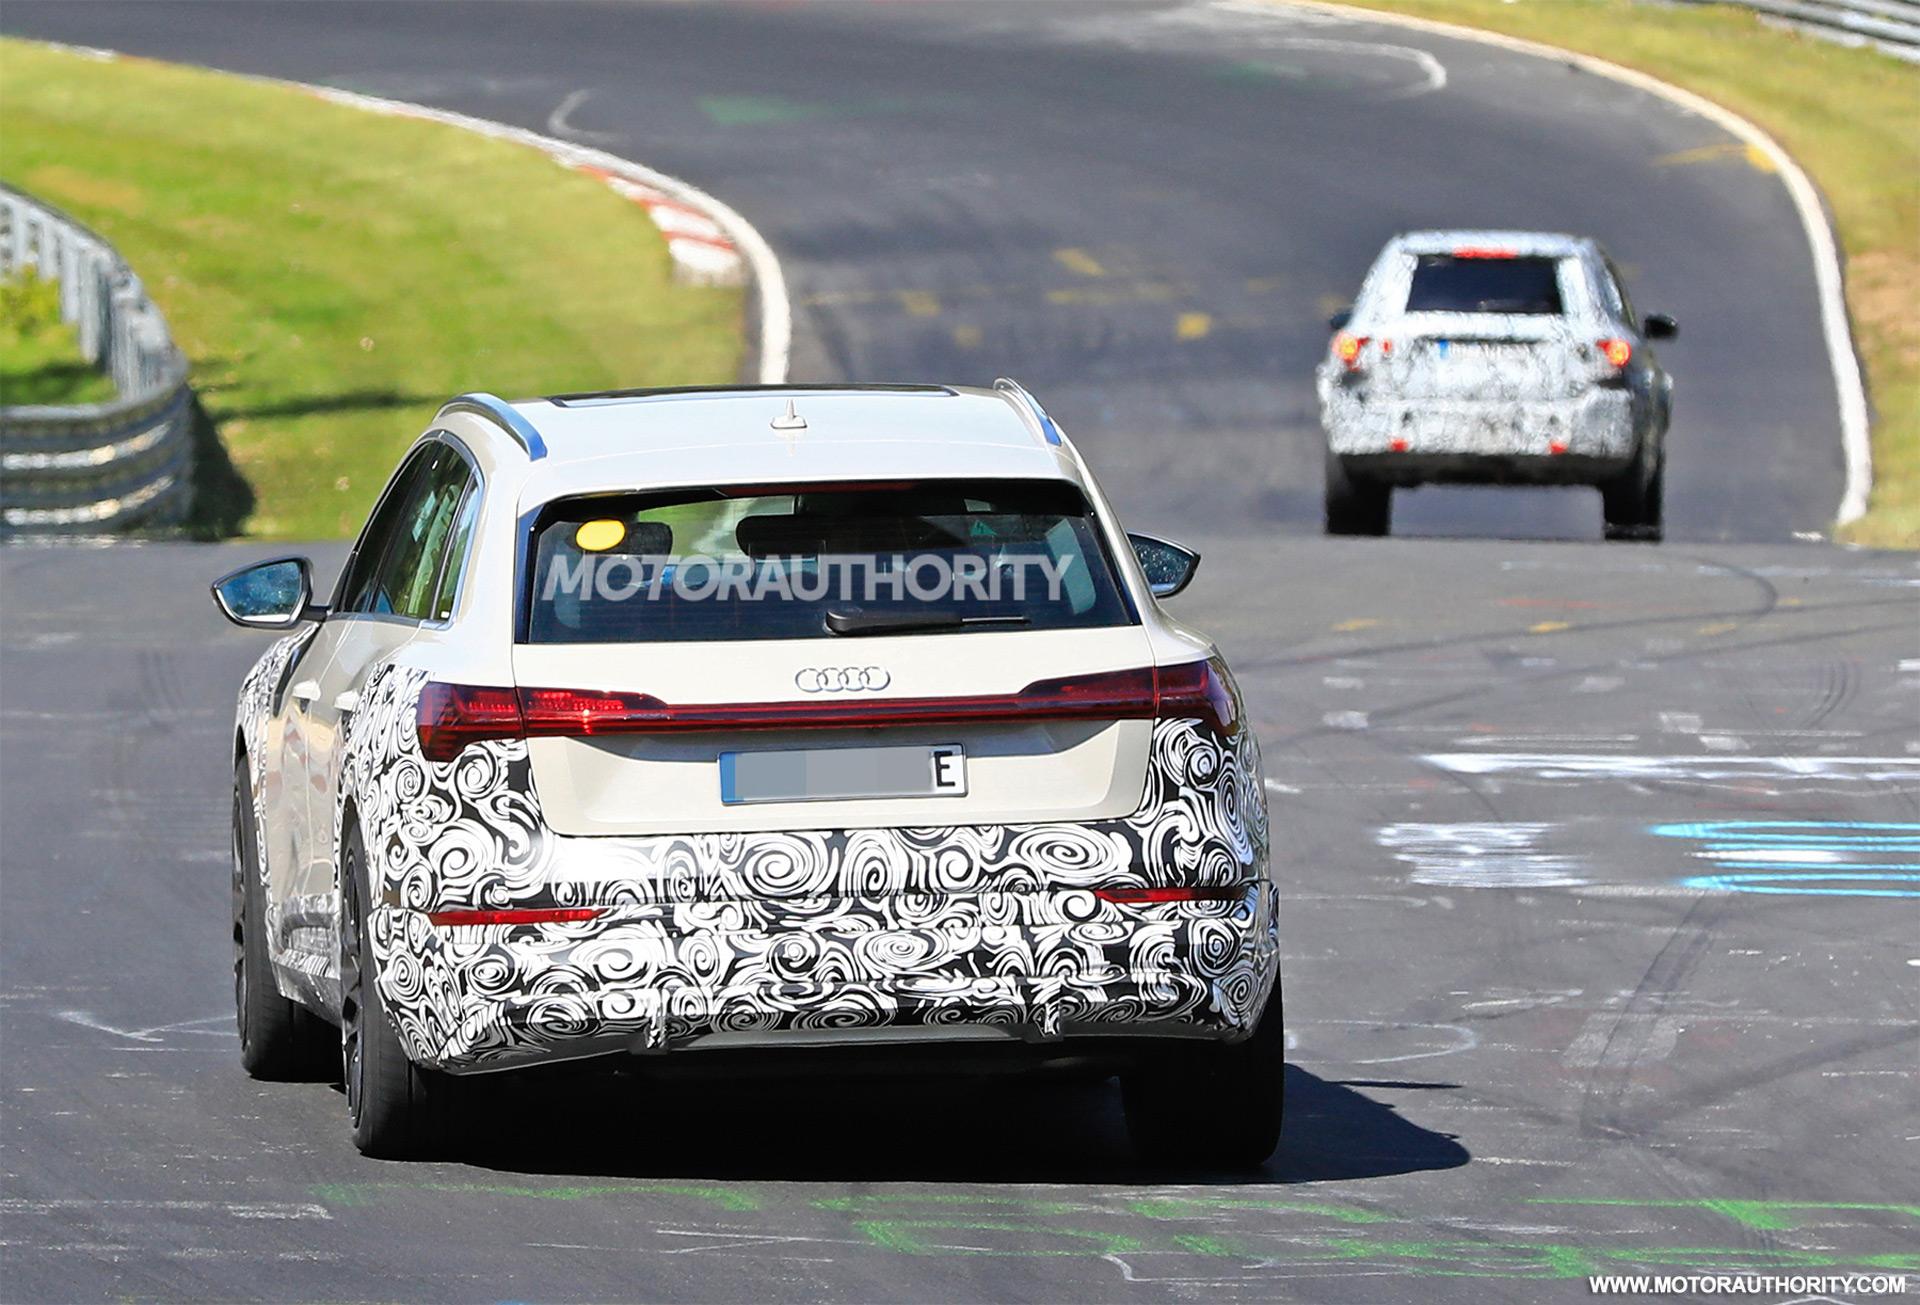 2018 [Audi] E-Tron Quattro - Page 7 2020-audi-e-tron-s-spy-shots--image-via-s-baldauf-sb-medien_100702346_h